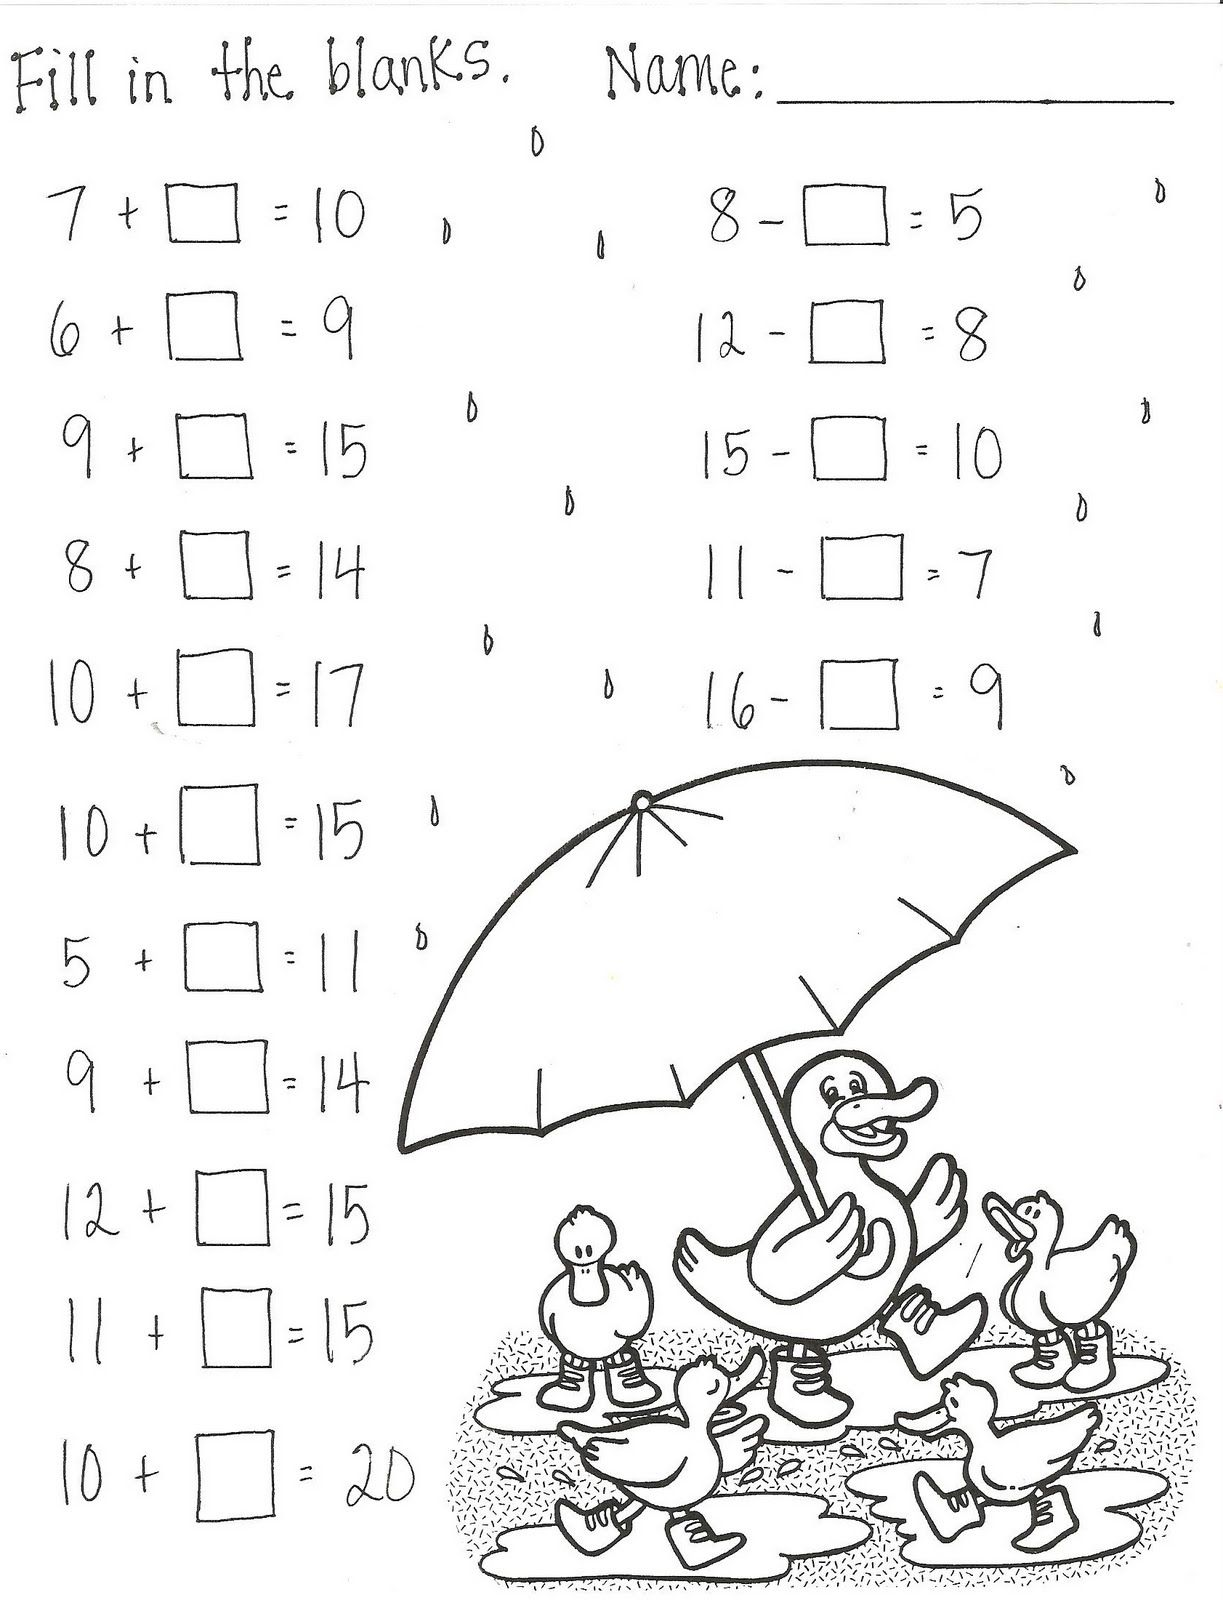 worksheet Double Digit Subtraction Worksheets dr seuss subtraction worksheets double digit clipart addition subtraction